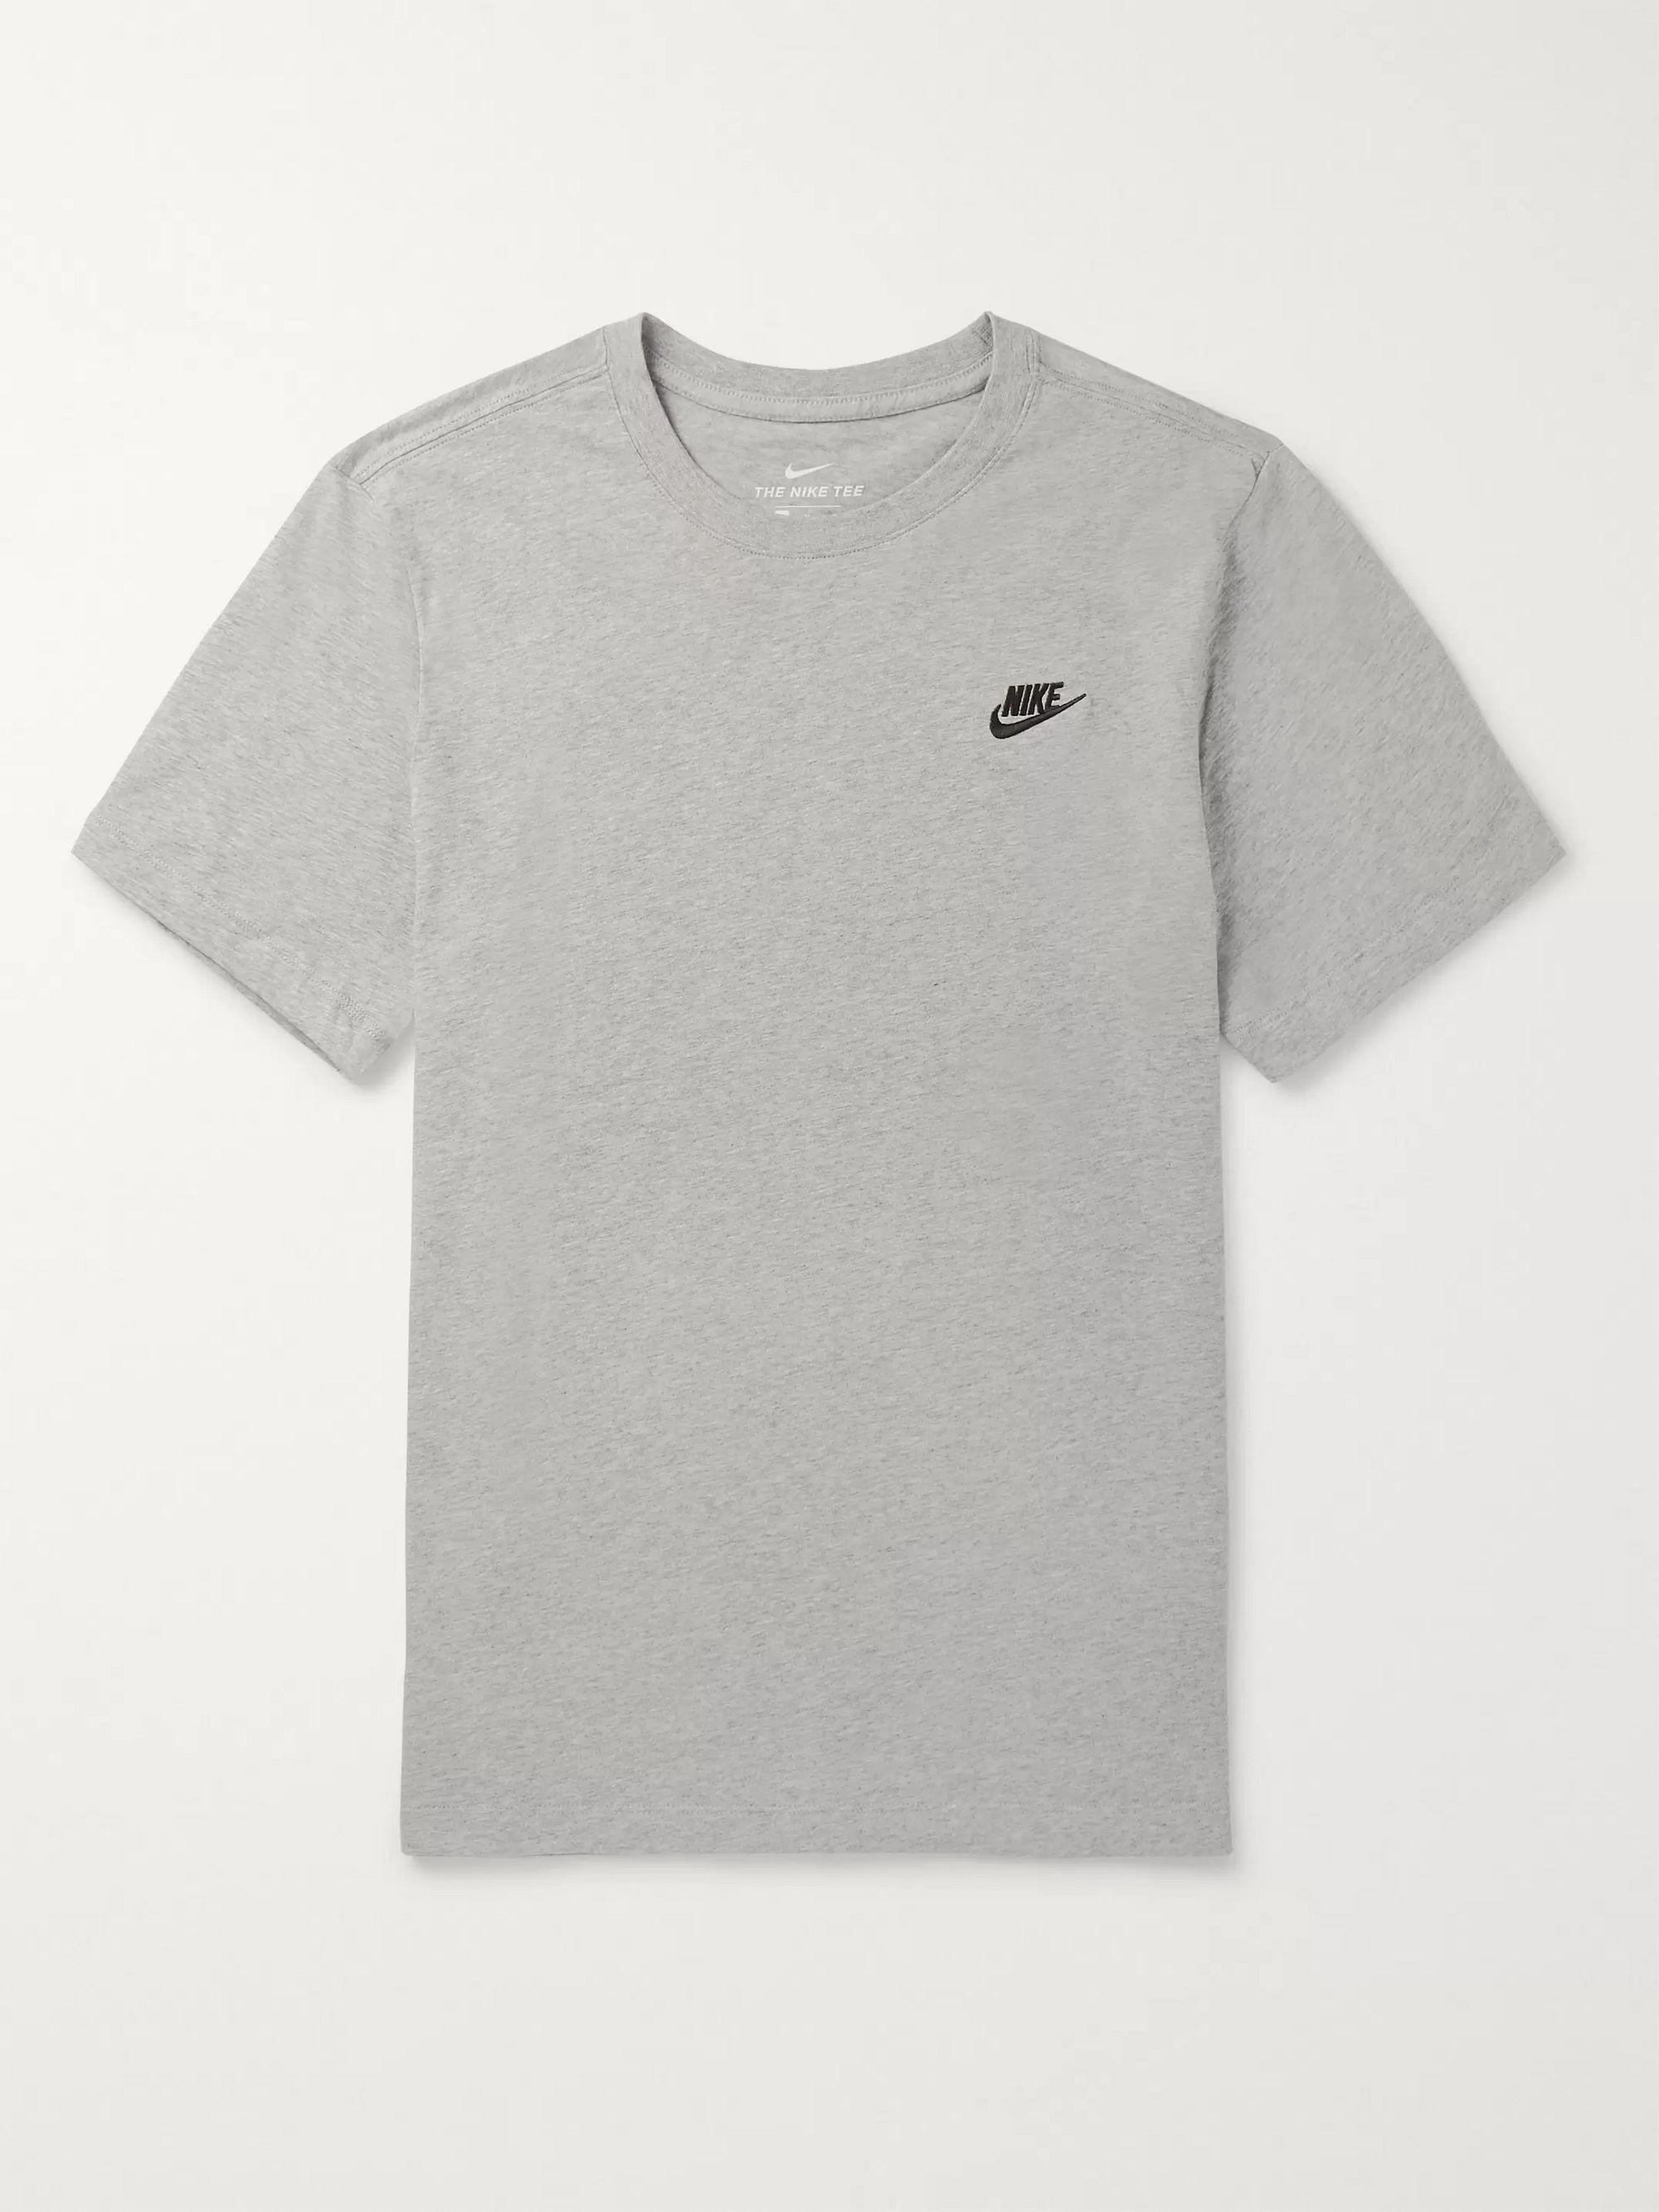 NIKE Logo-Embroidered Melange Cotton-Jersey T-Shirt